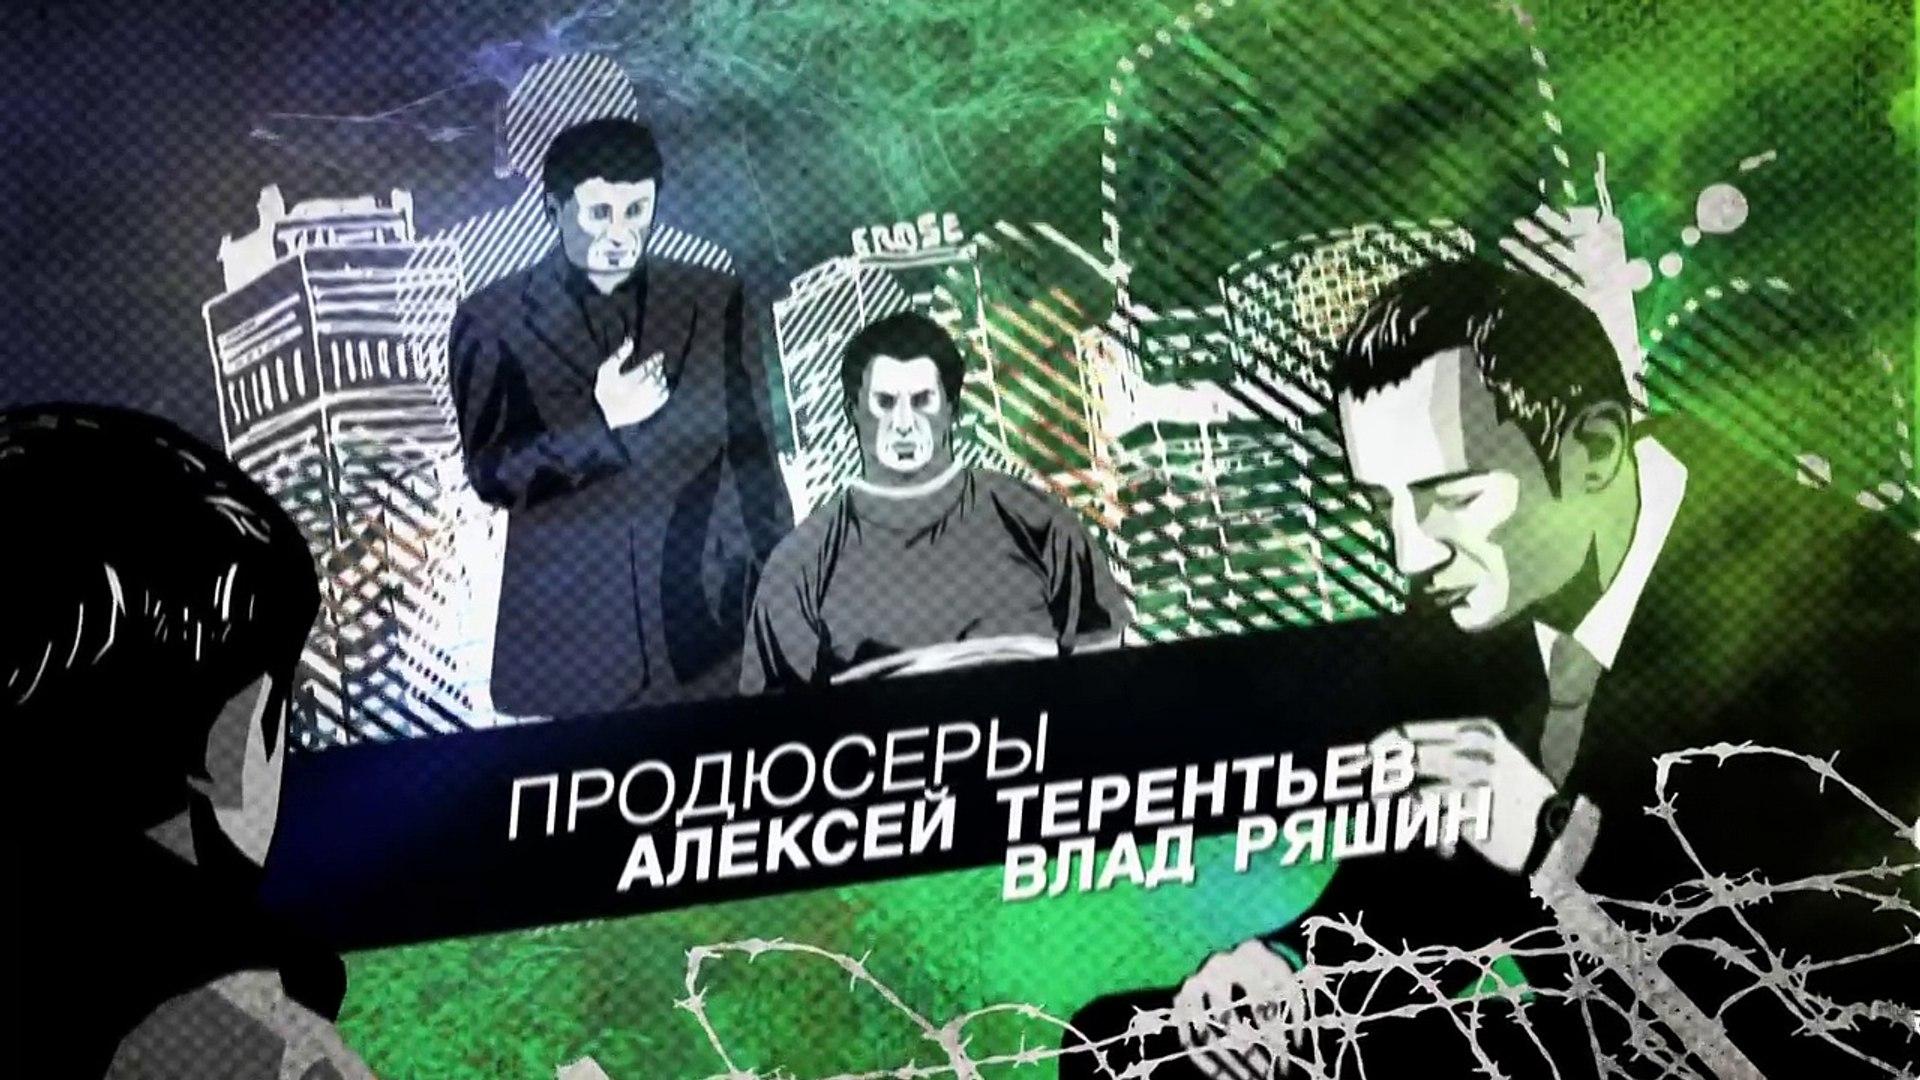 Кулинар. Сериал. Серия 1 из 20. Детектив 2018 russkie detektivi 2018